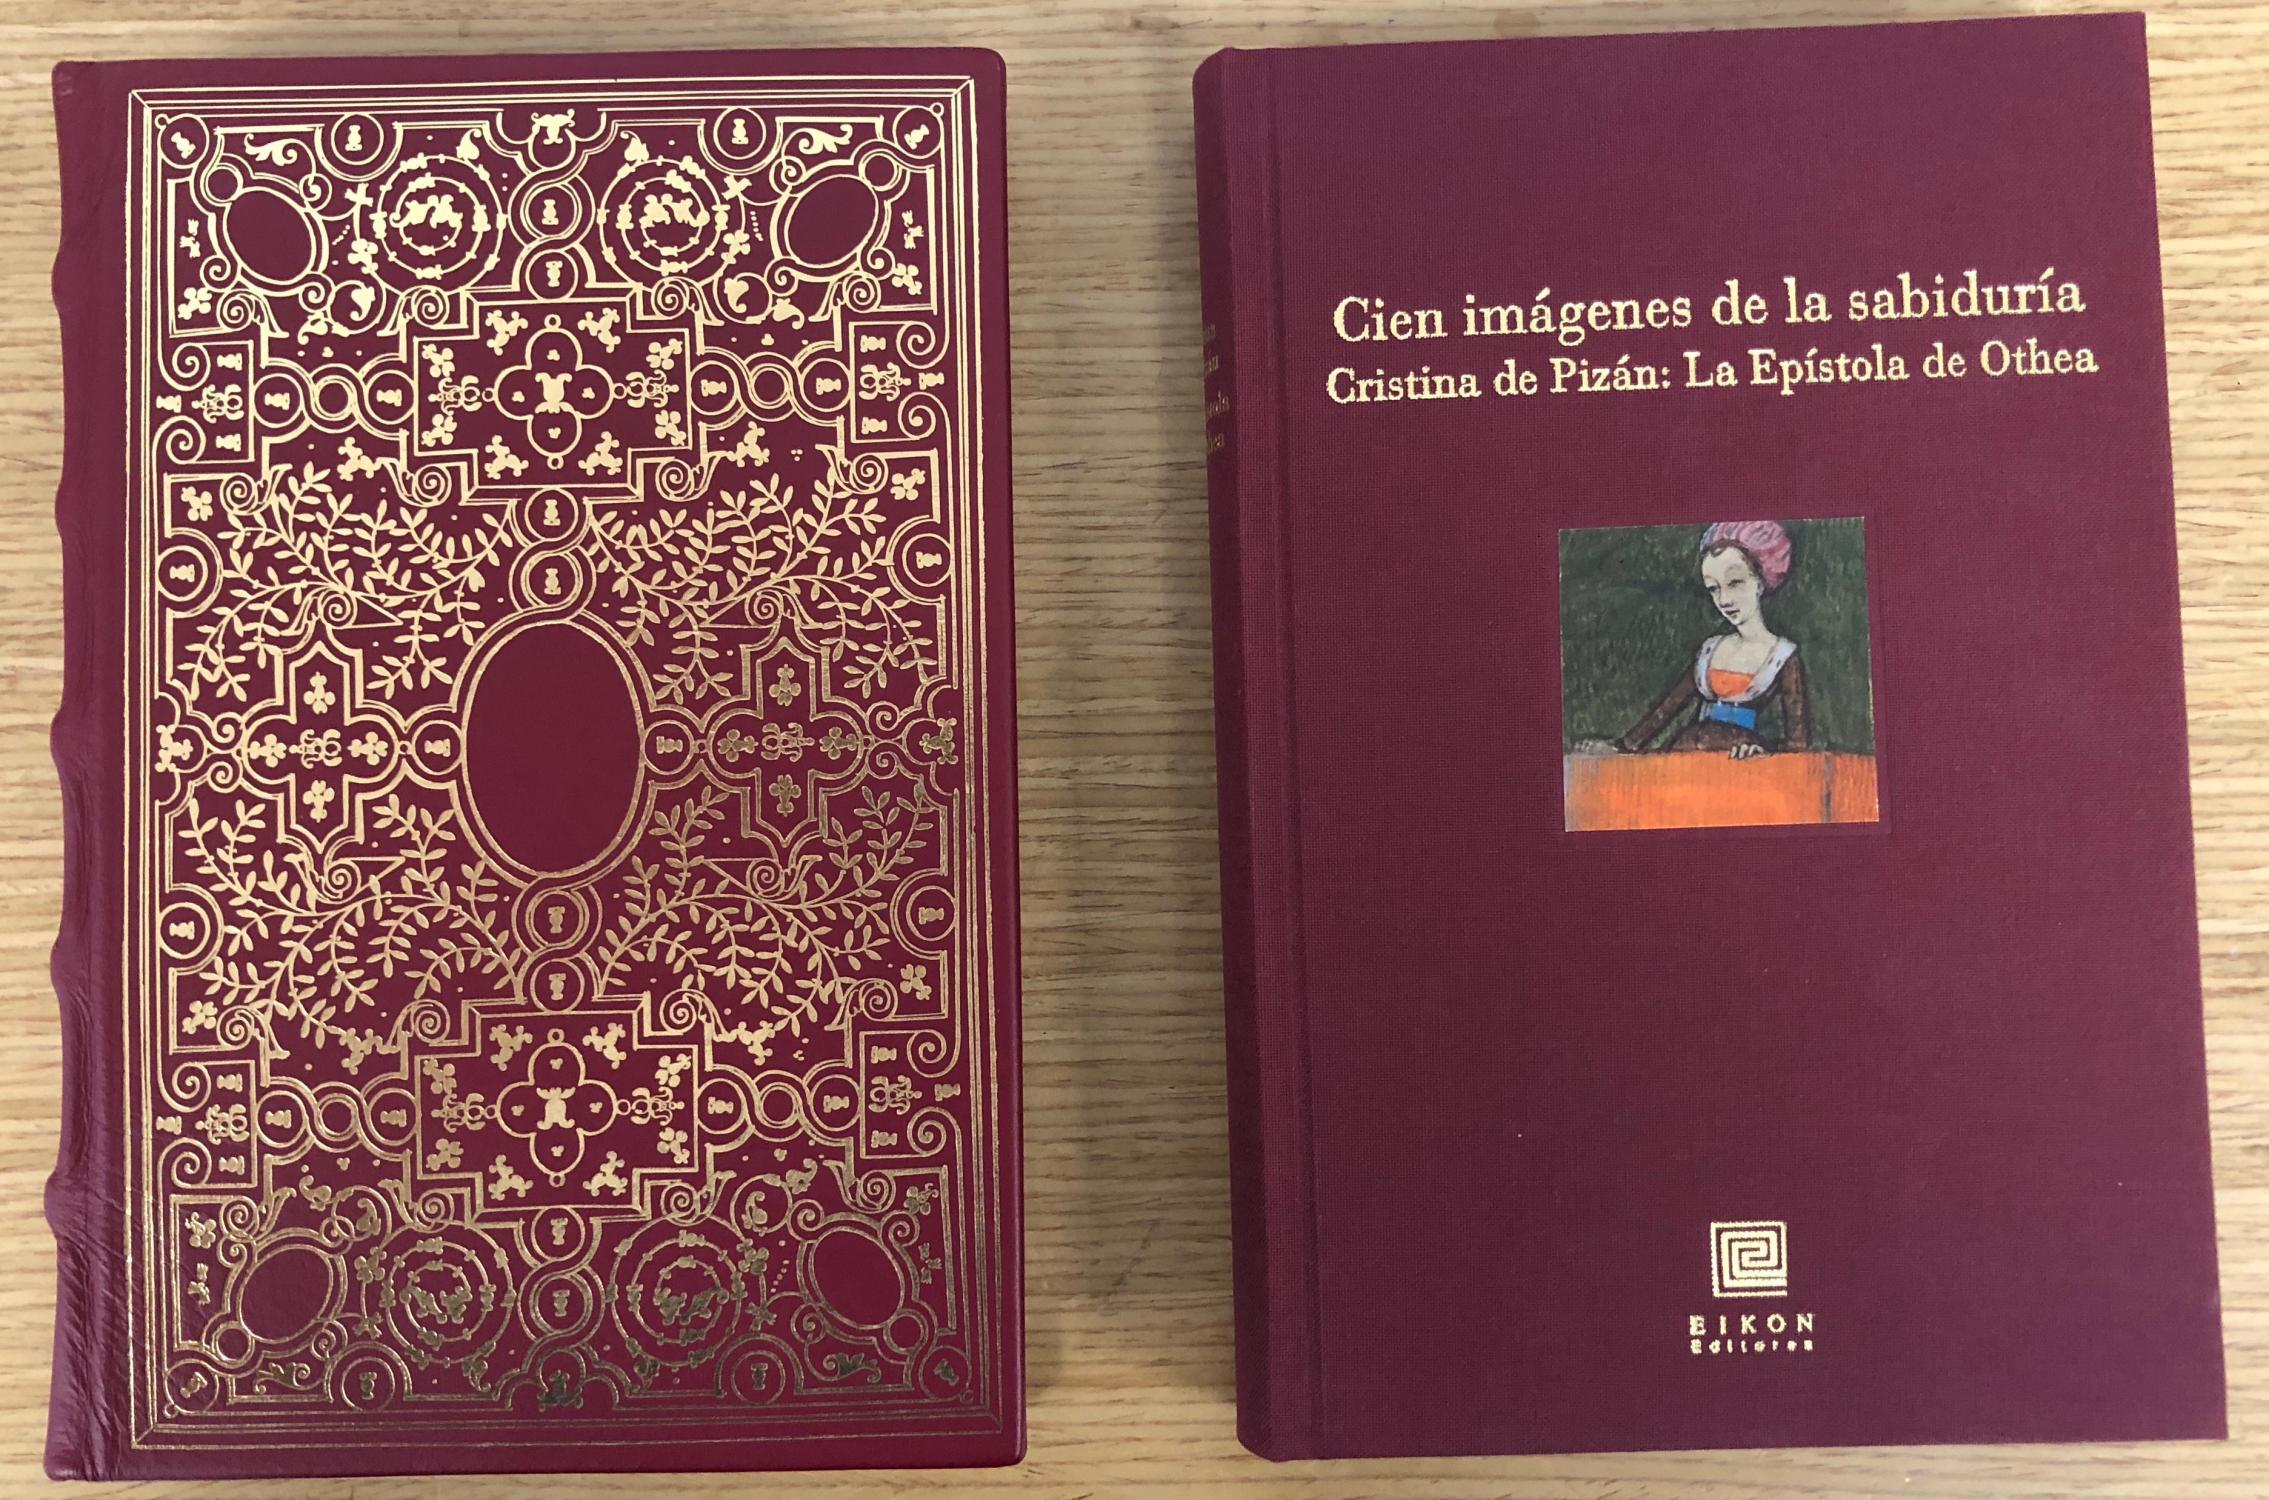 Christine de Pizan / Cristina de Pizán: Epistre othea / 100 imágenes de sabiduría . - Christine de Pisan